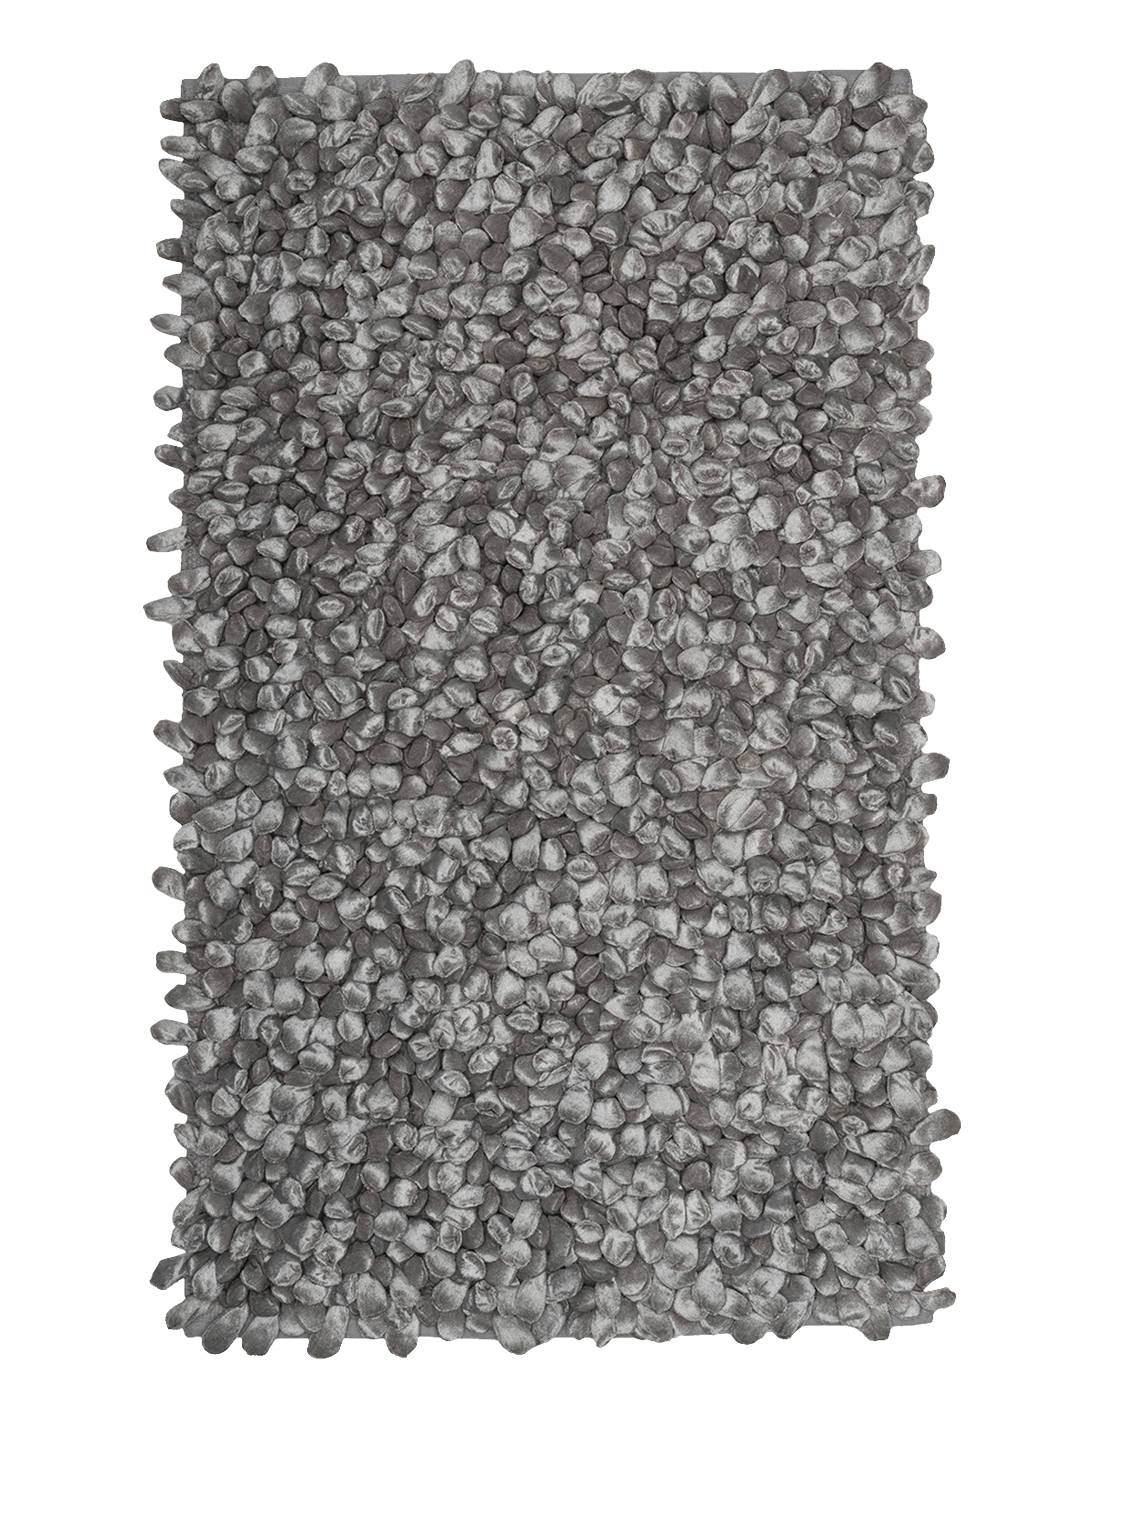 Image of Aquanova Badematte Rocca grau